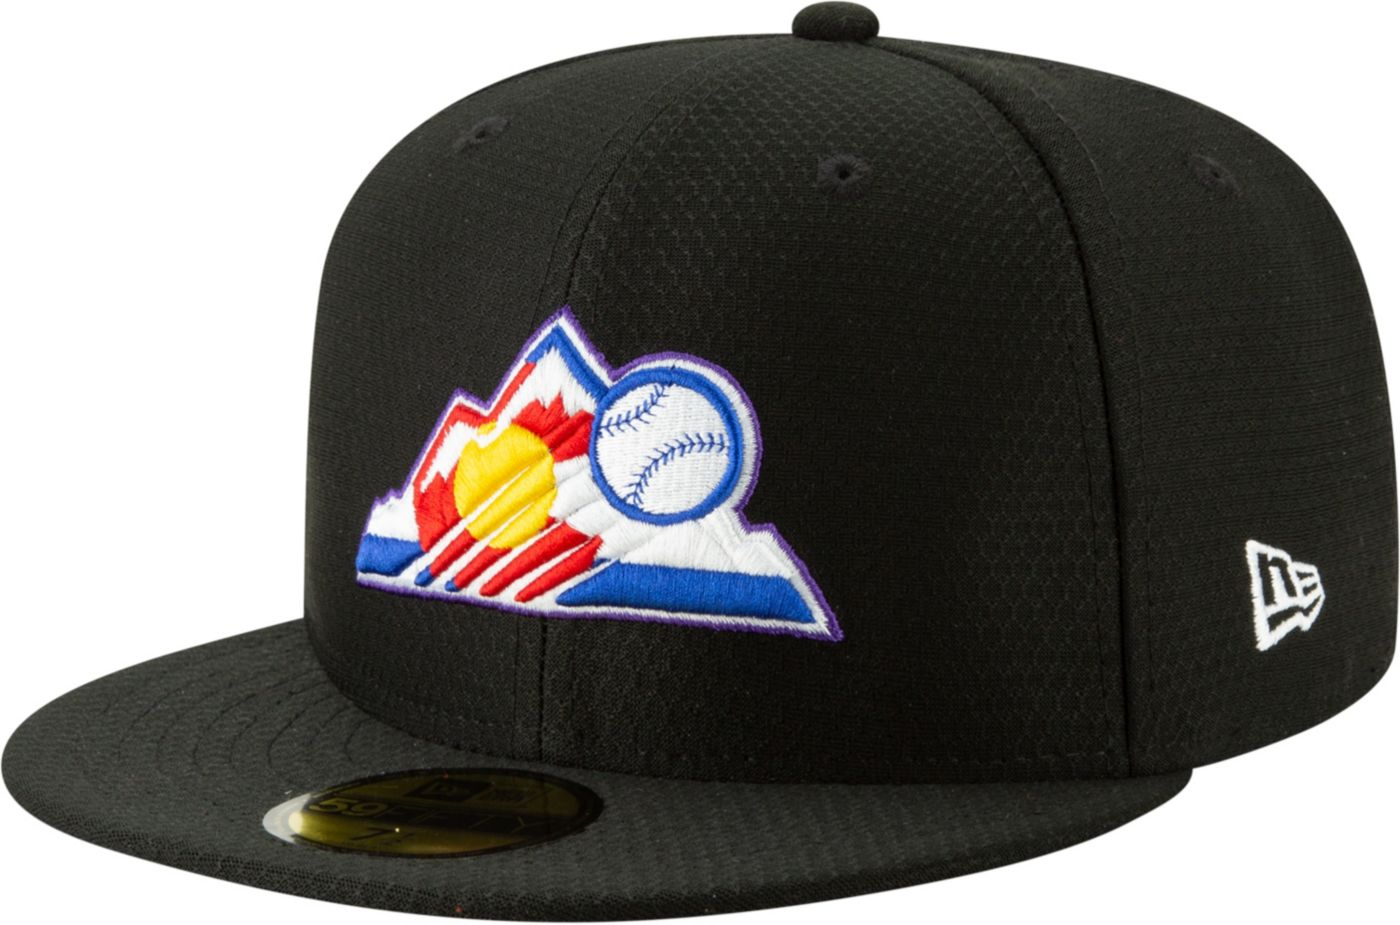 New Era Men's Colorado Rockies 59Fifty HexTech Batting Practice Fitted Hat